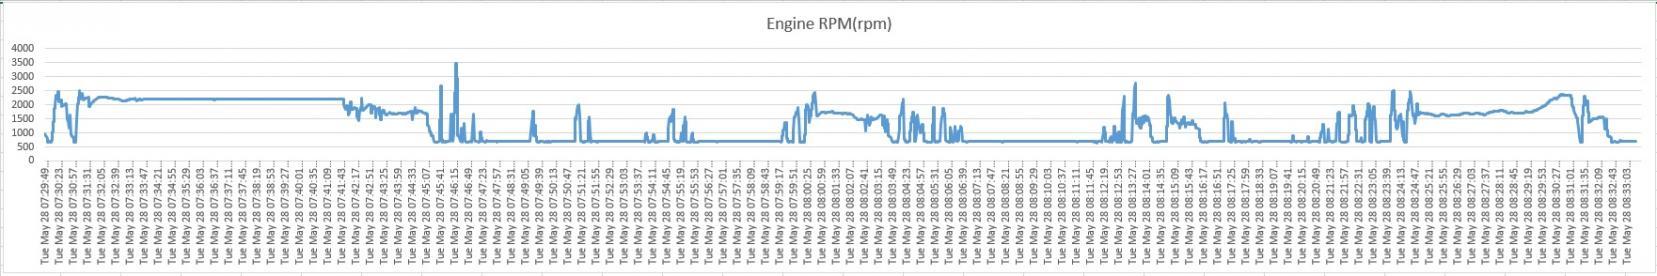 Powermax: cast vs Batmo vs Single plane-5_28_2013_rpm_morningcommute.jpg